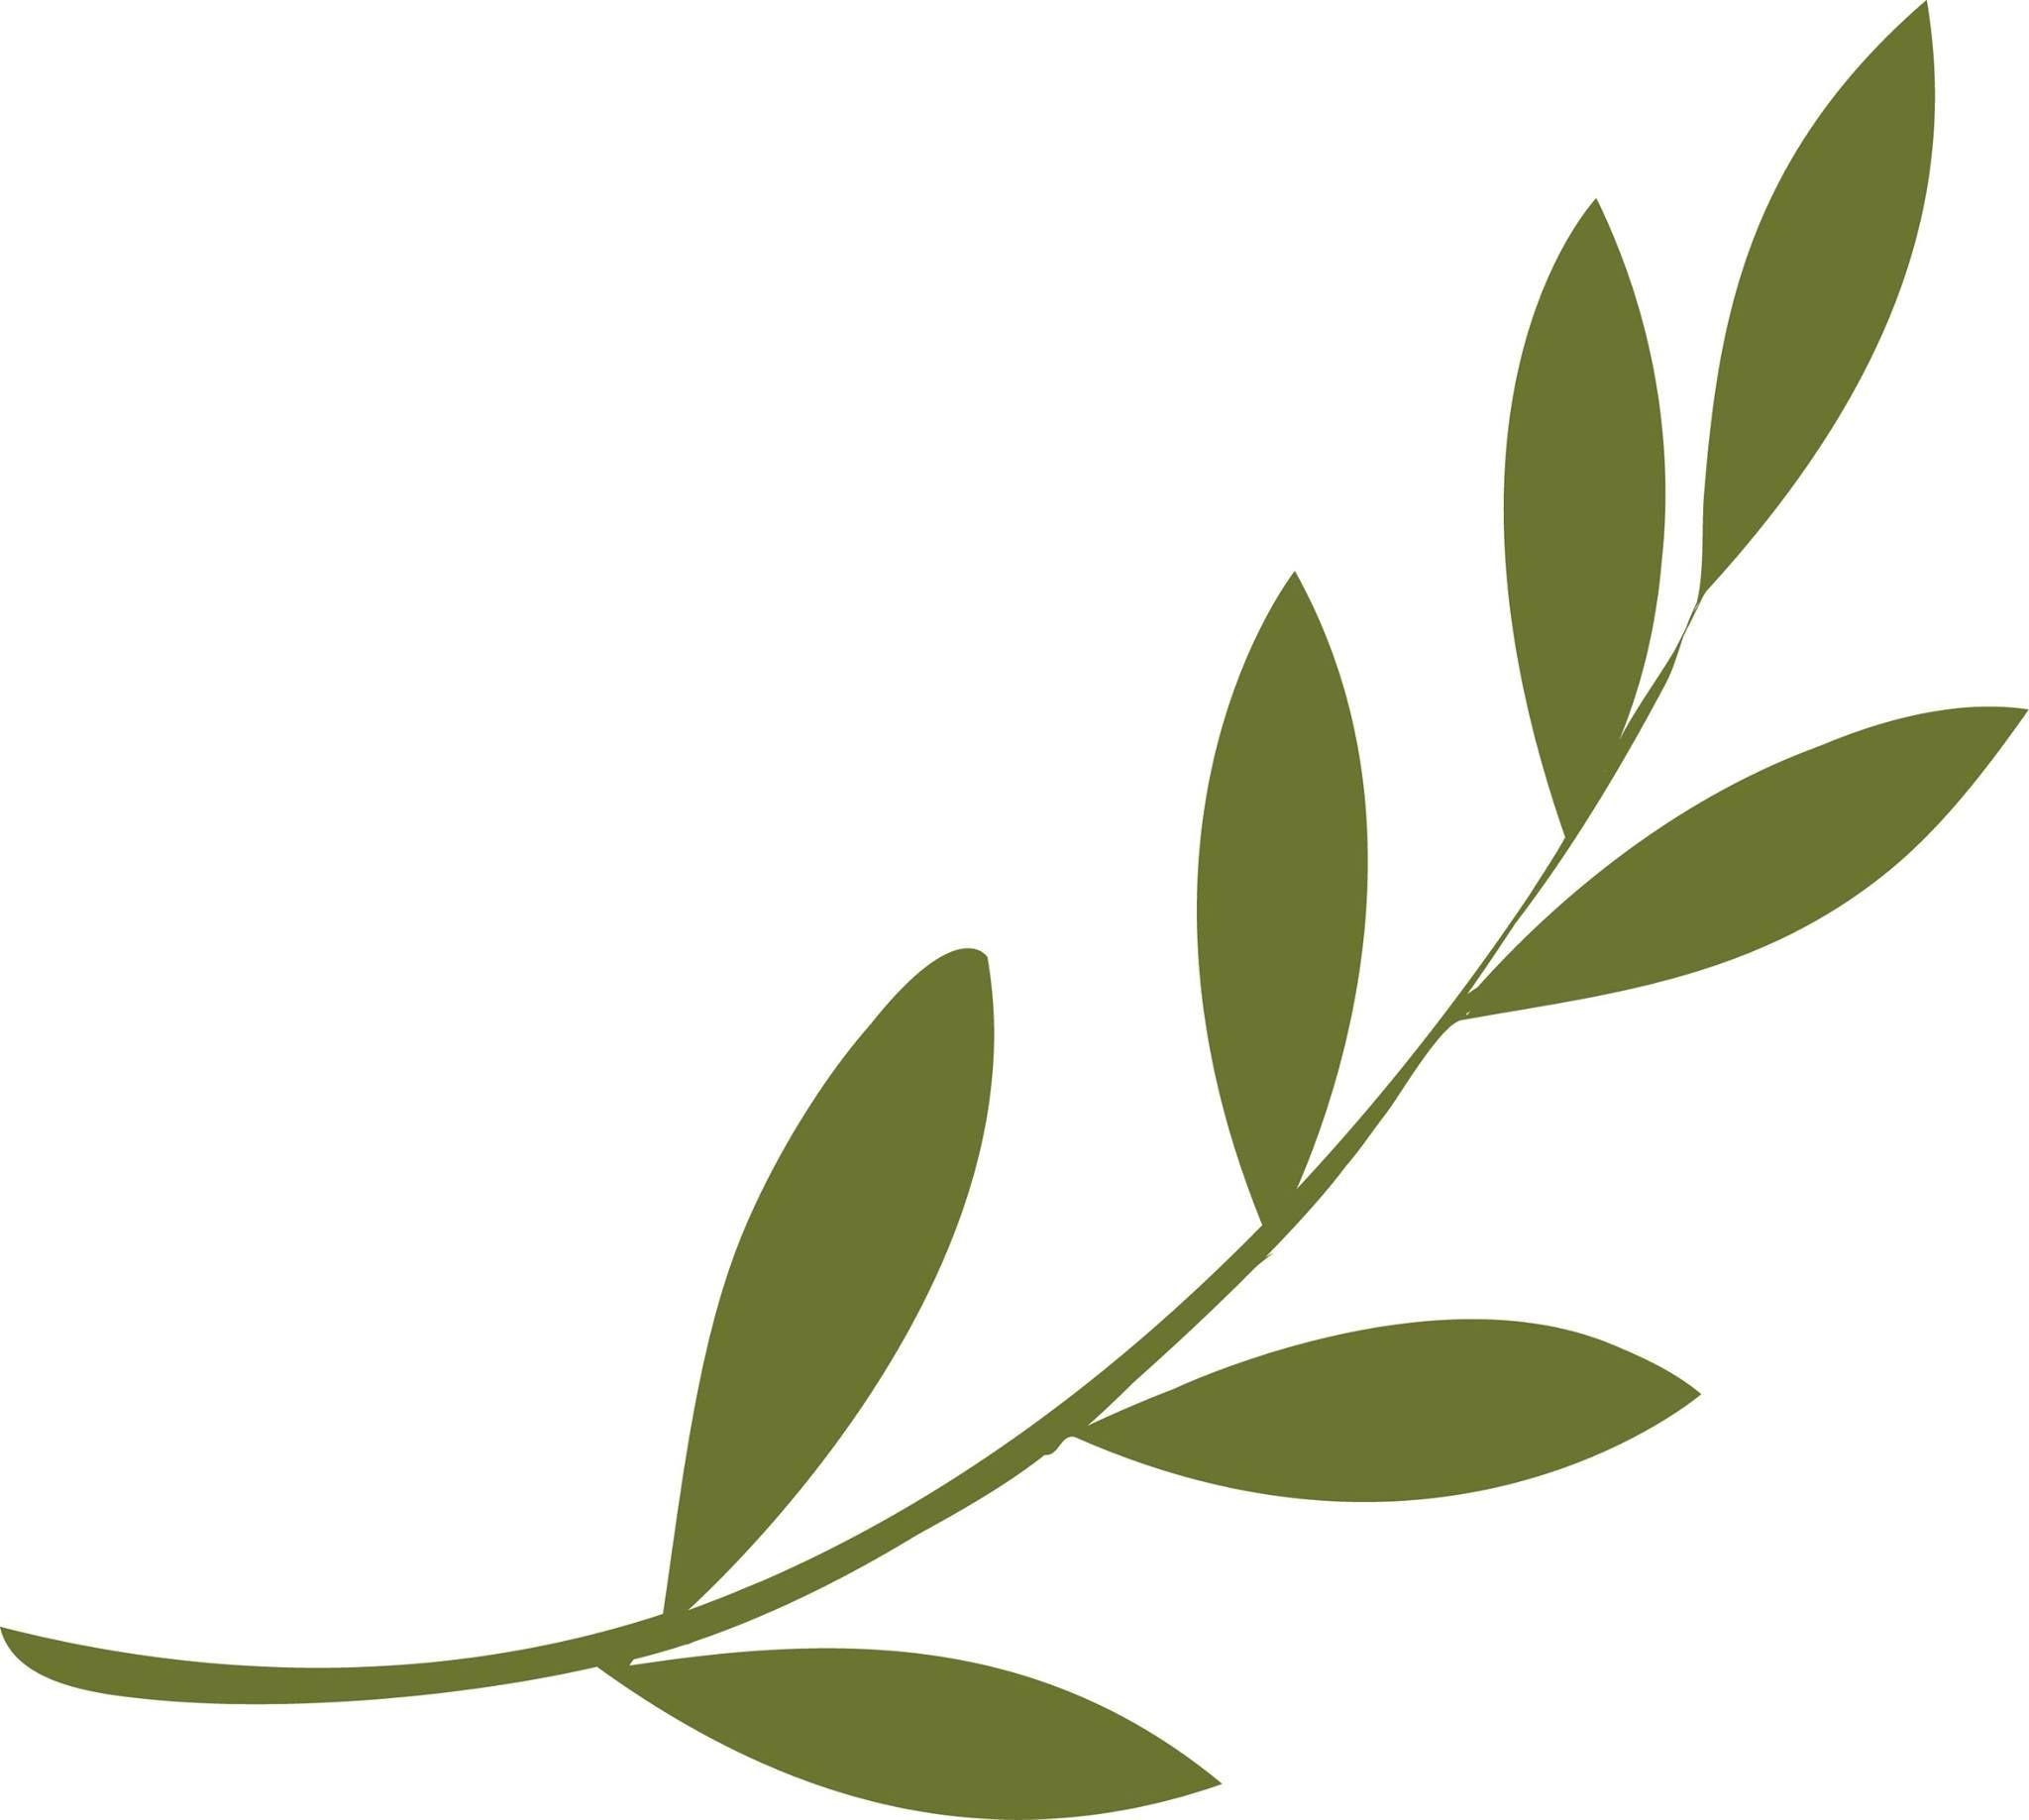 Olive branch | Crafts I want to make | Pinterest